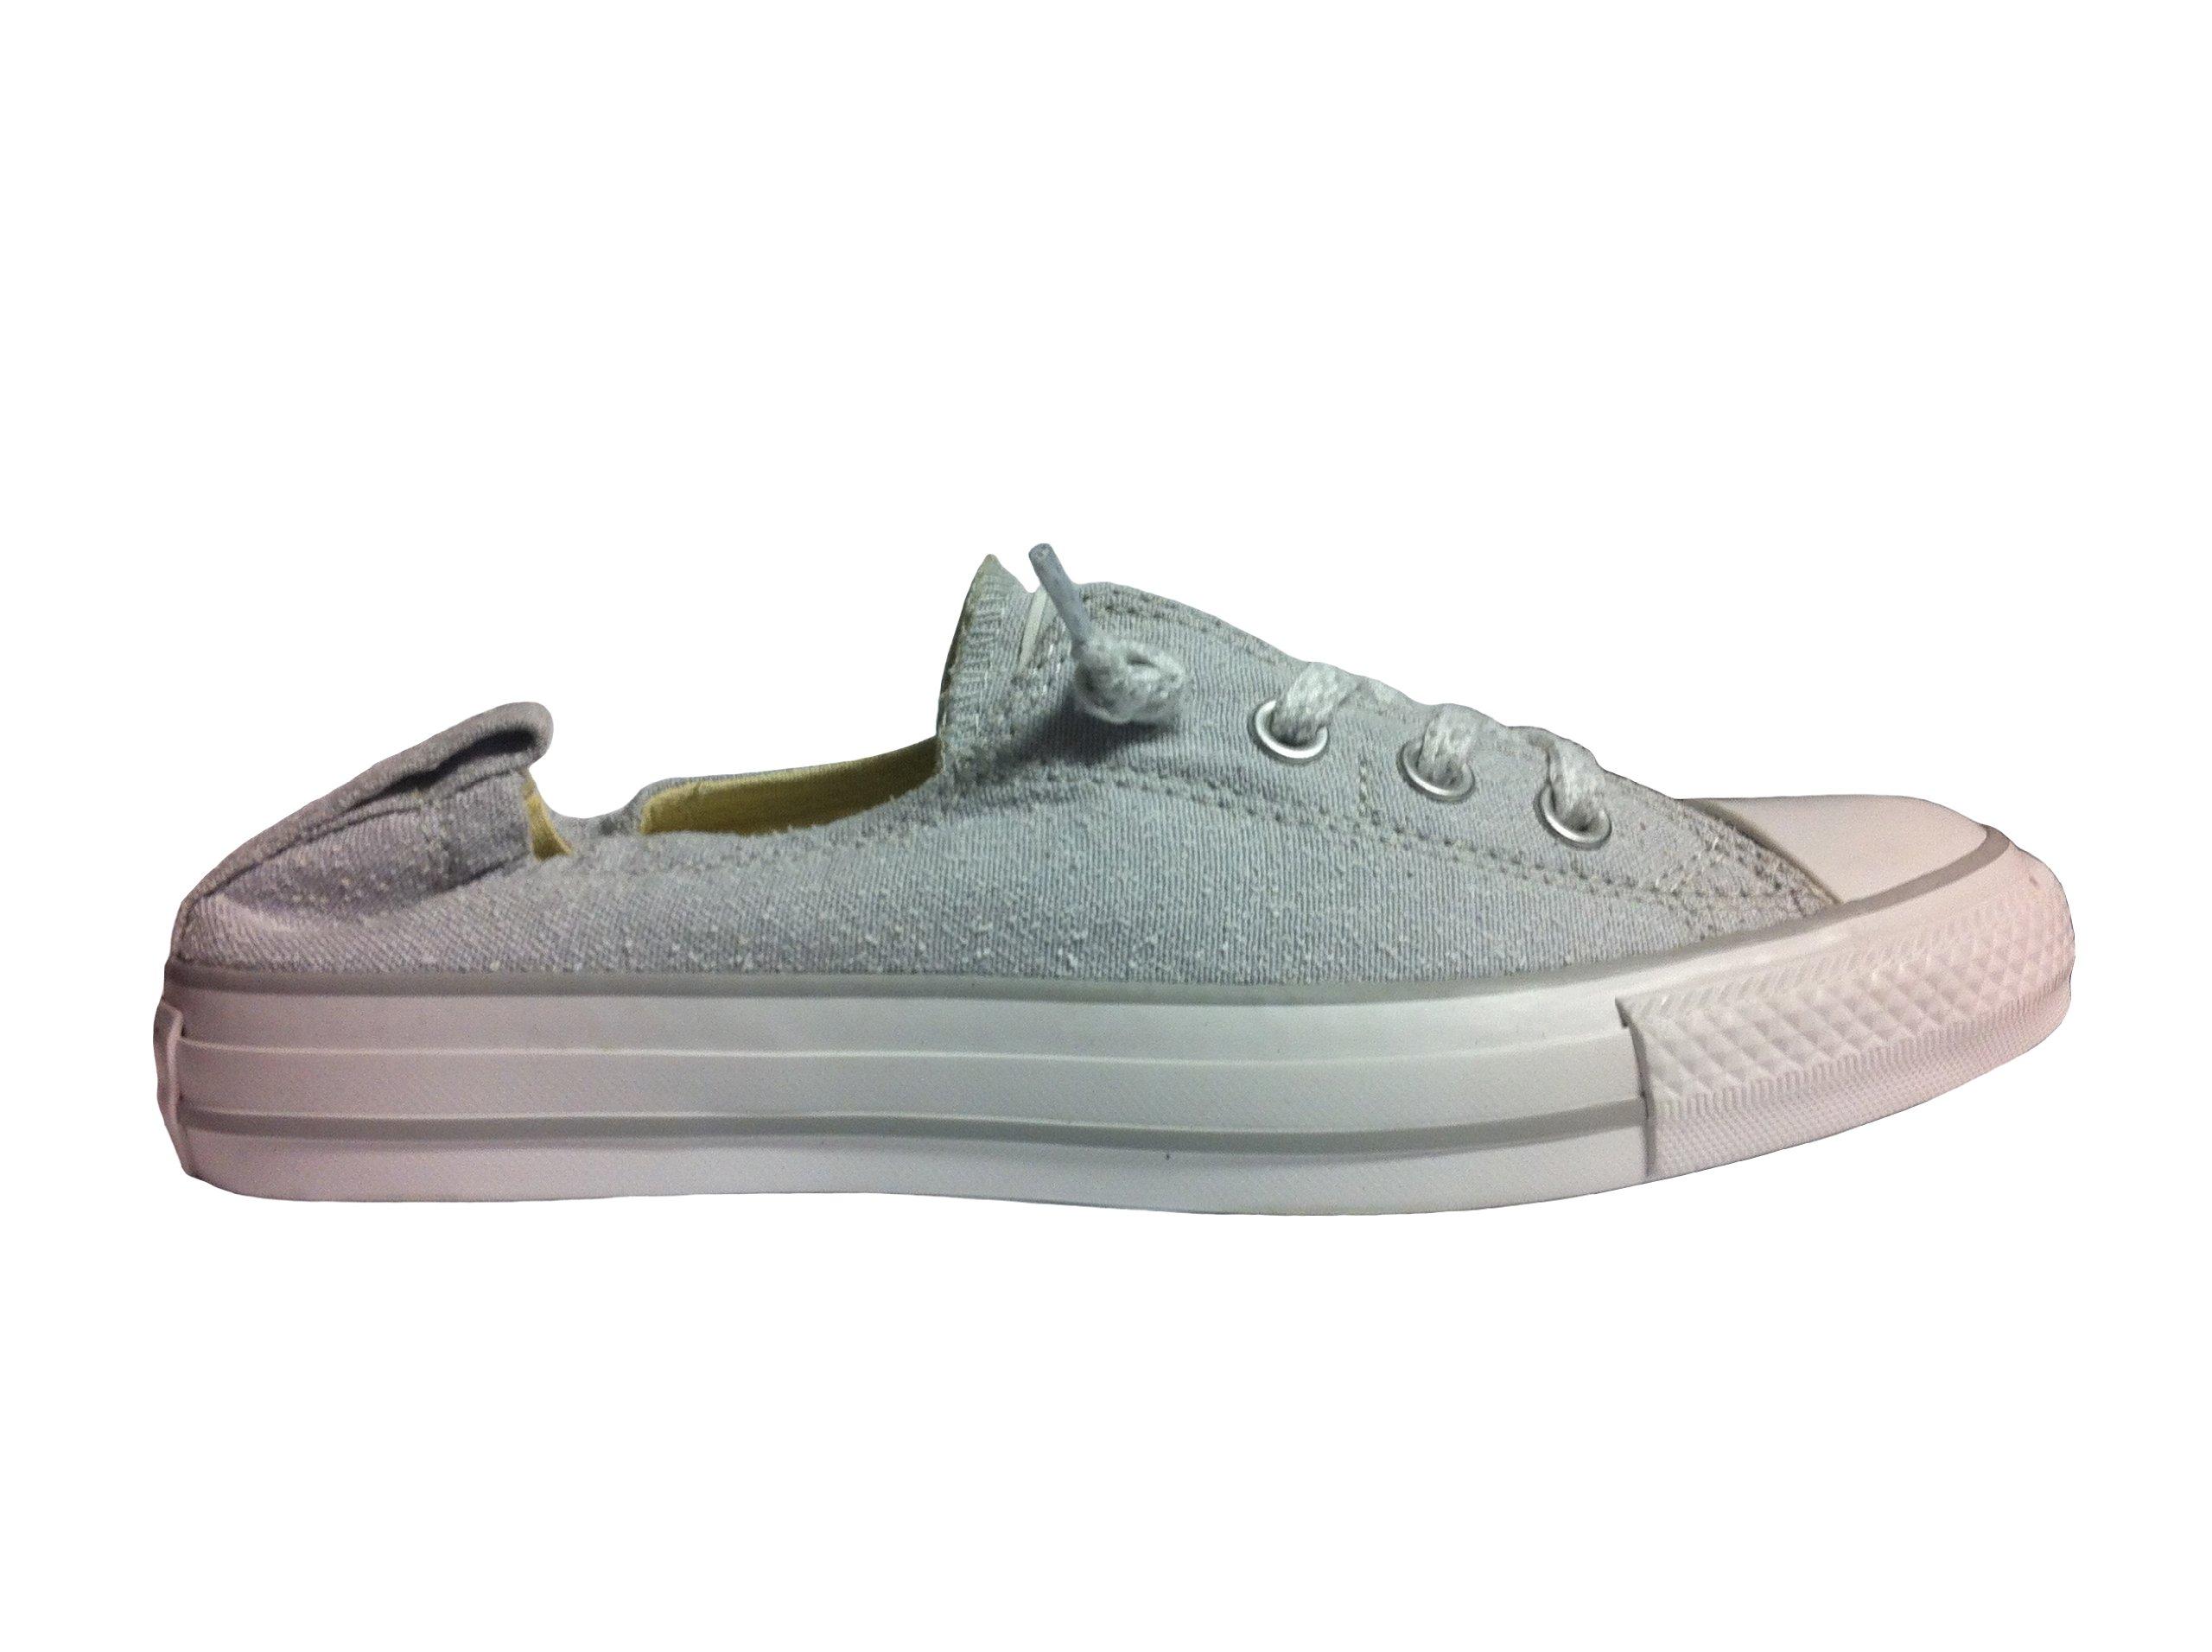 a262f5cc7d4 Converse Chuck Taylor All Star Shoreline Slip Oyster Gray